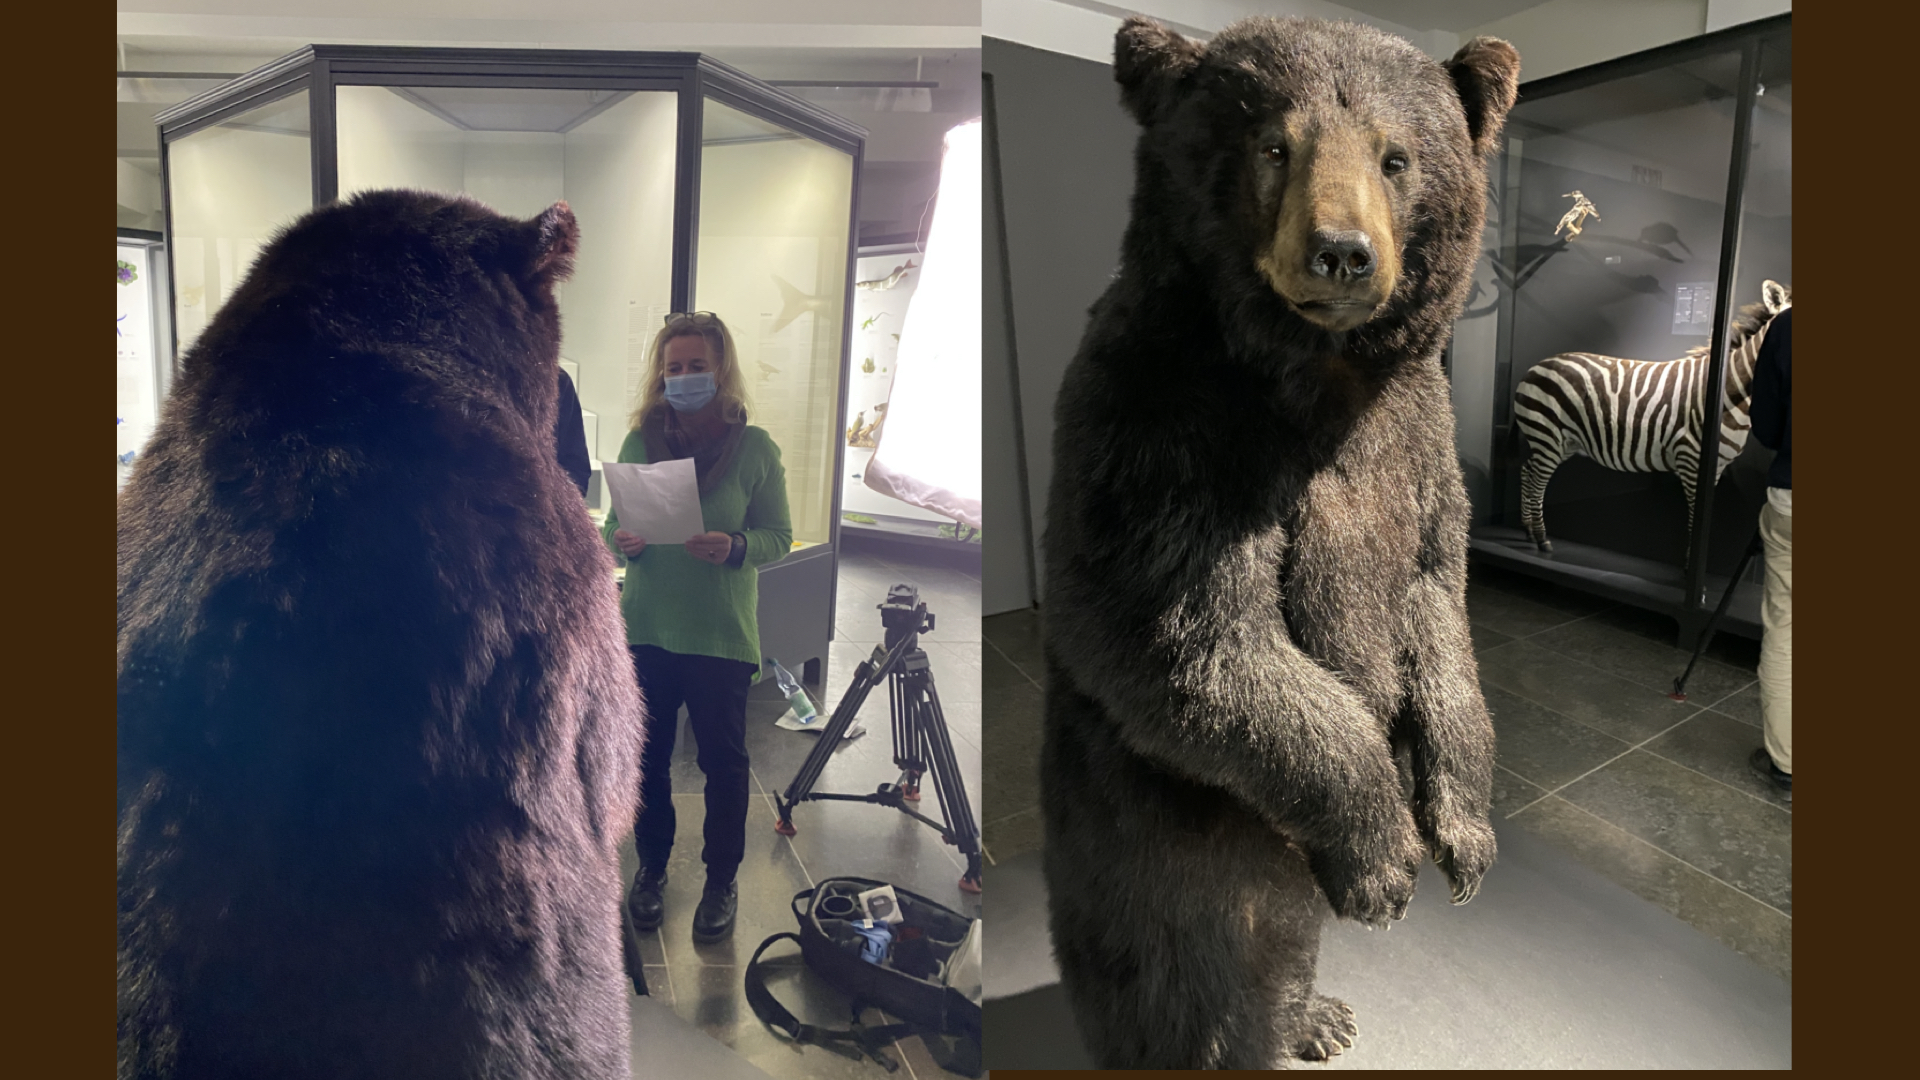 Bäreninterview